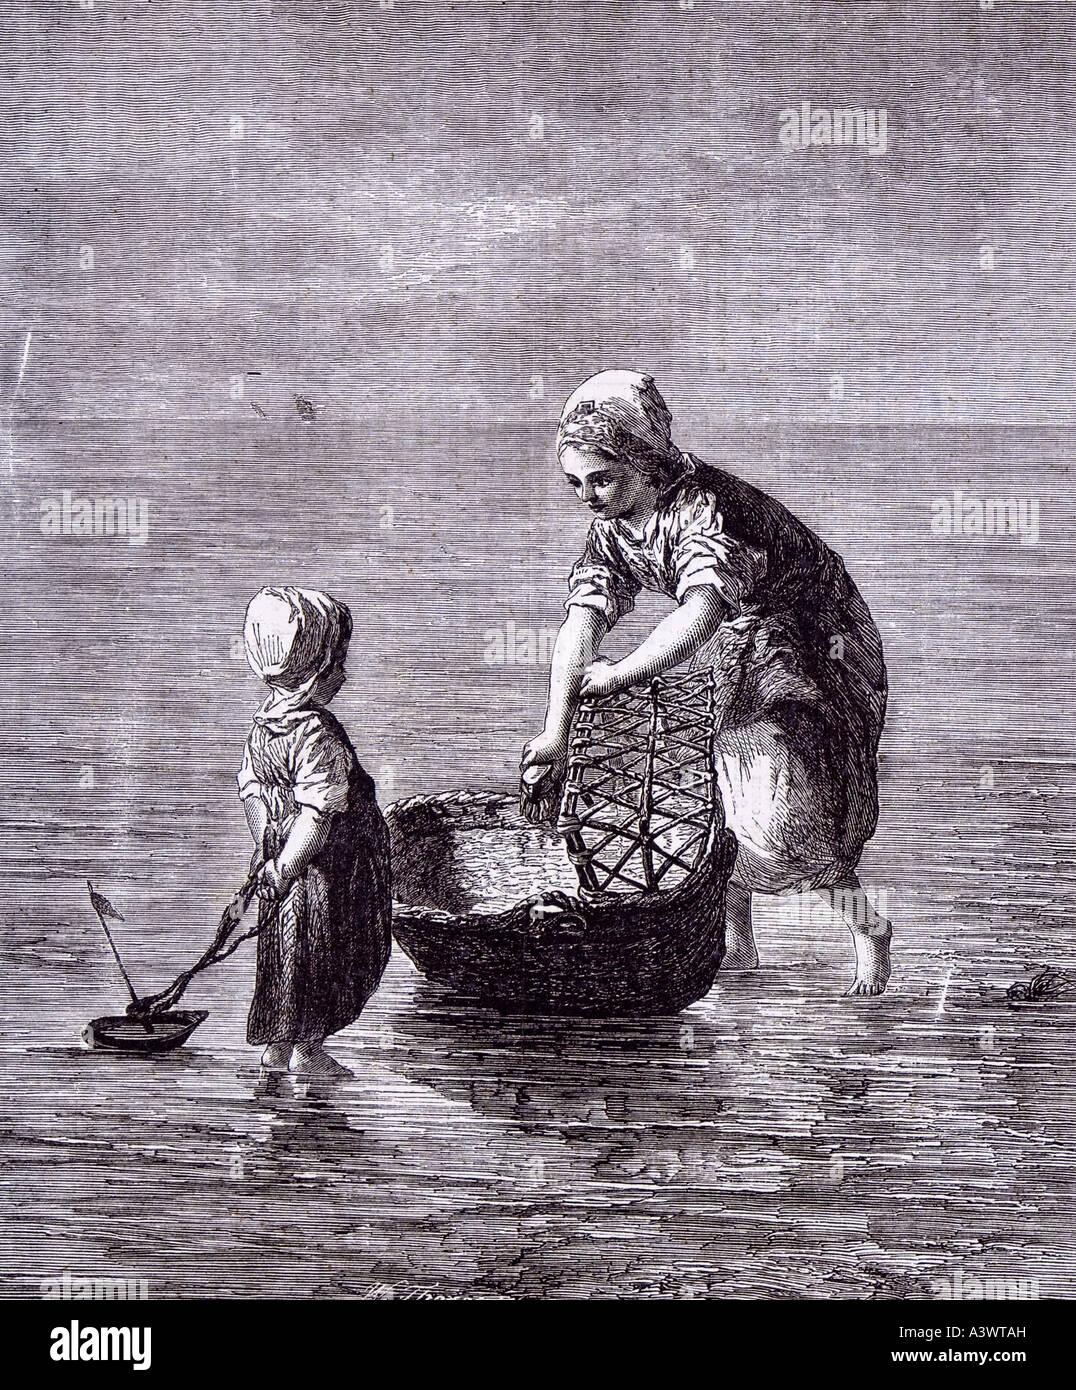 Artista holandés art child hermana barco canasta de Moisés CUNA CUNA CUNA niñez Imagen De Stock